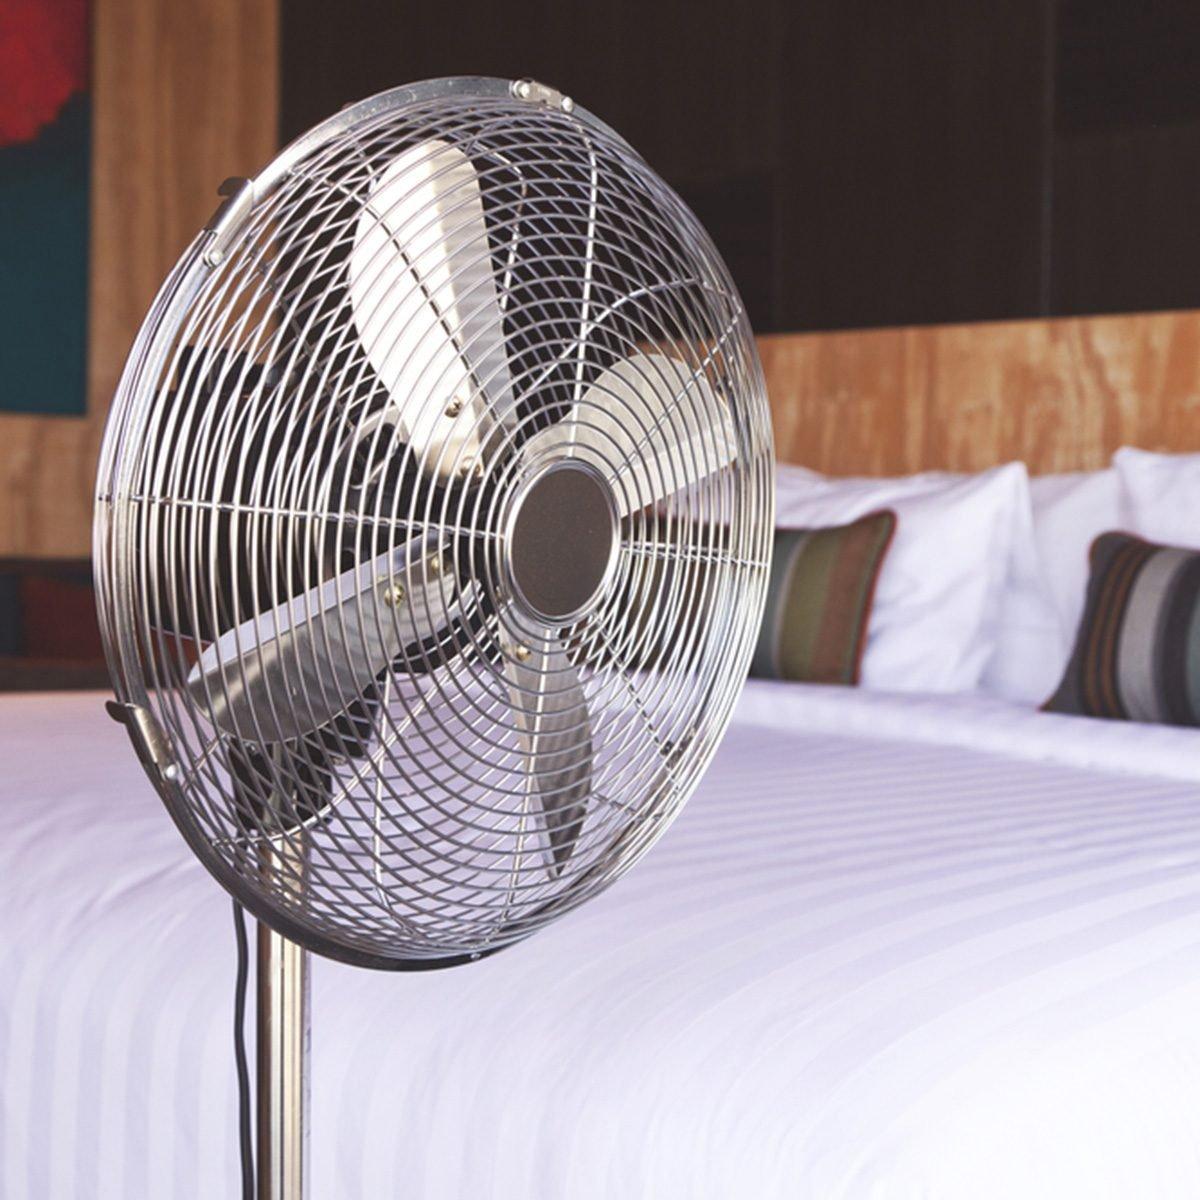 electric fan in the room; Shutterstock ID 336276917; Job (TFH, TOH, RD, BNB, CWM, CM): Taste of Home